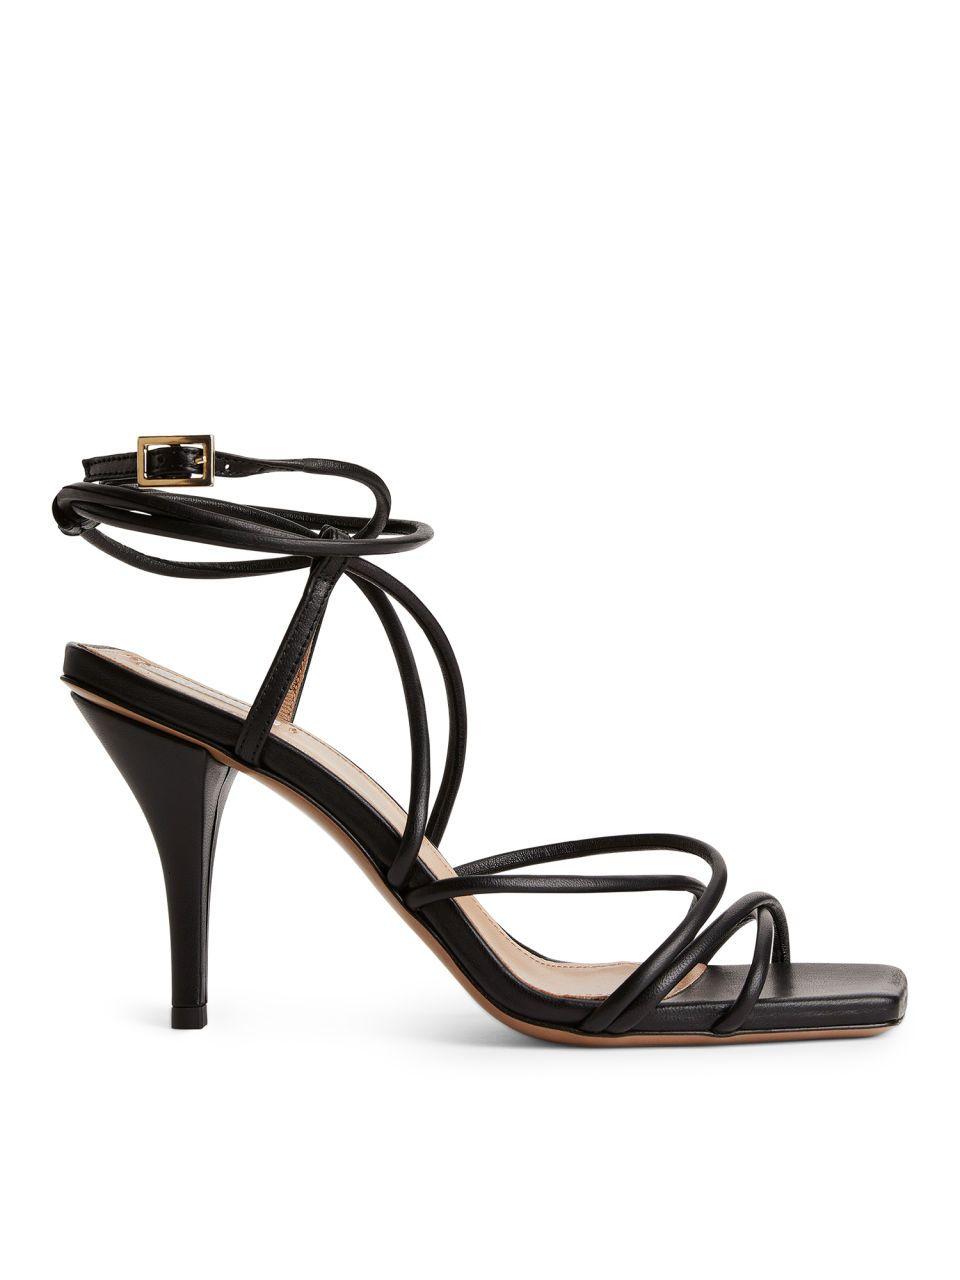 High Heel Leather Strap Sandal Black Shoes | Ankle strap